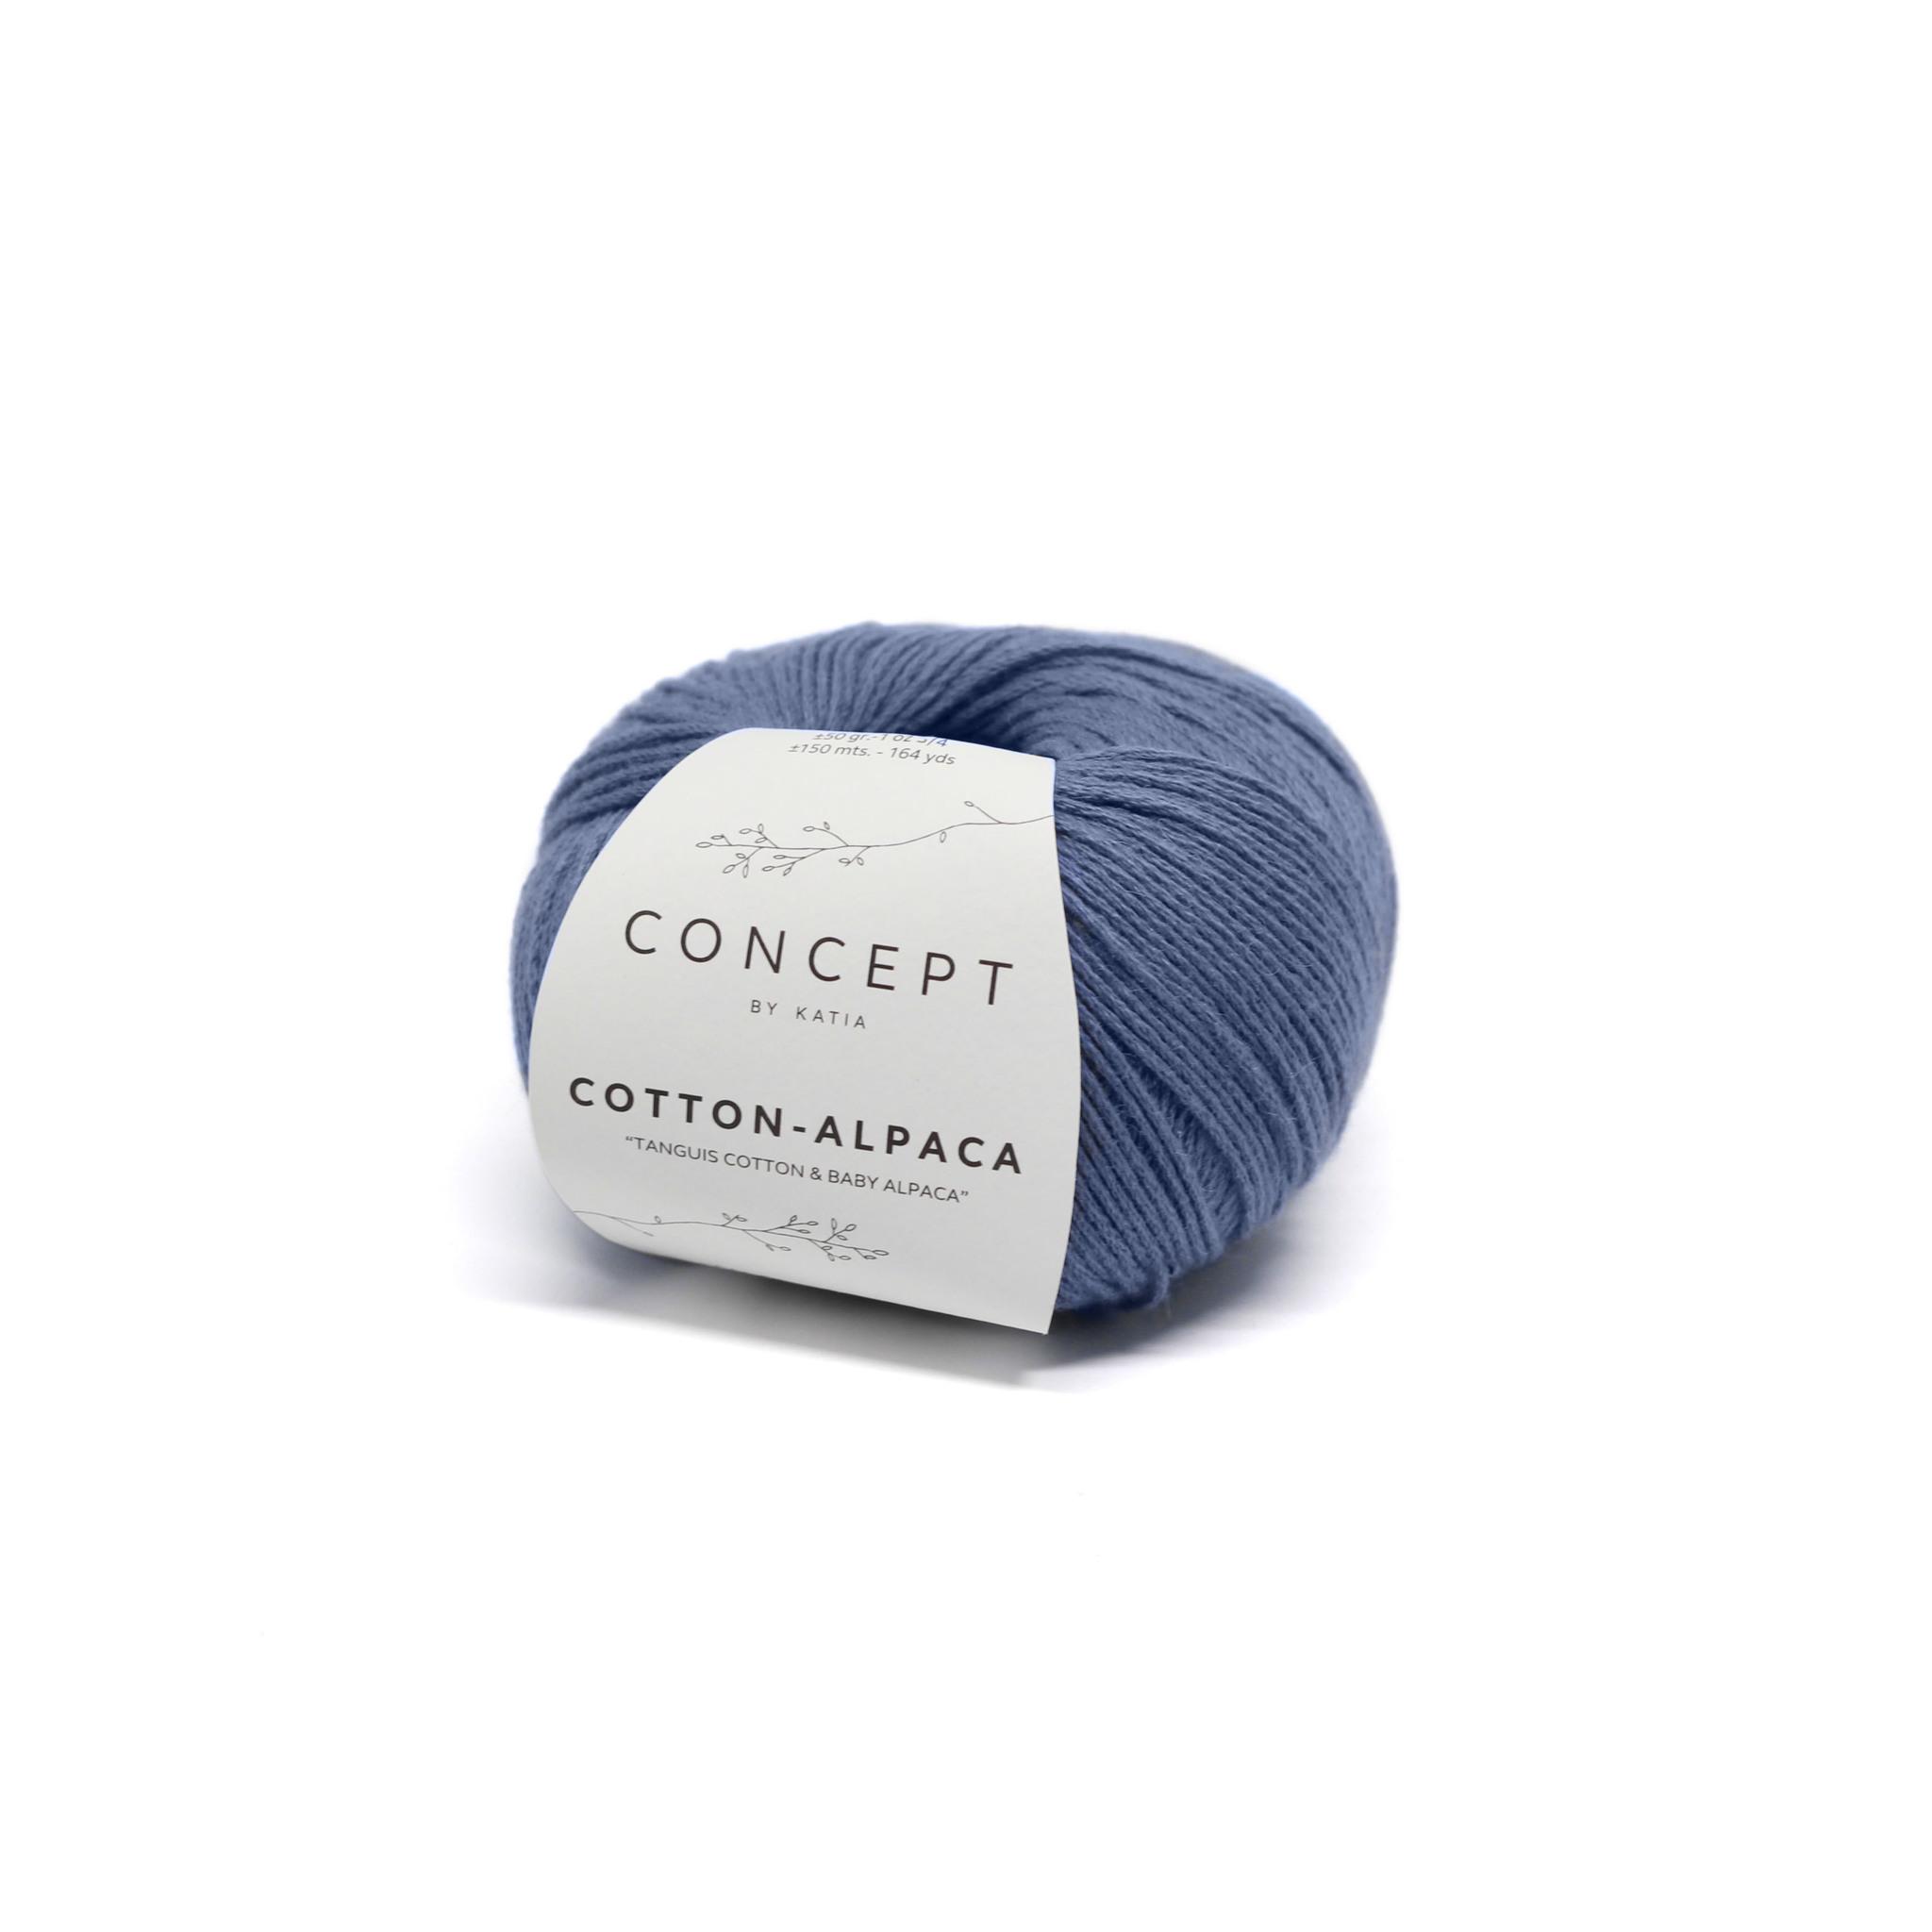 Katia Concept Cotton-Alpaca - 93